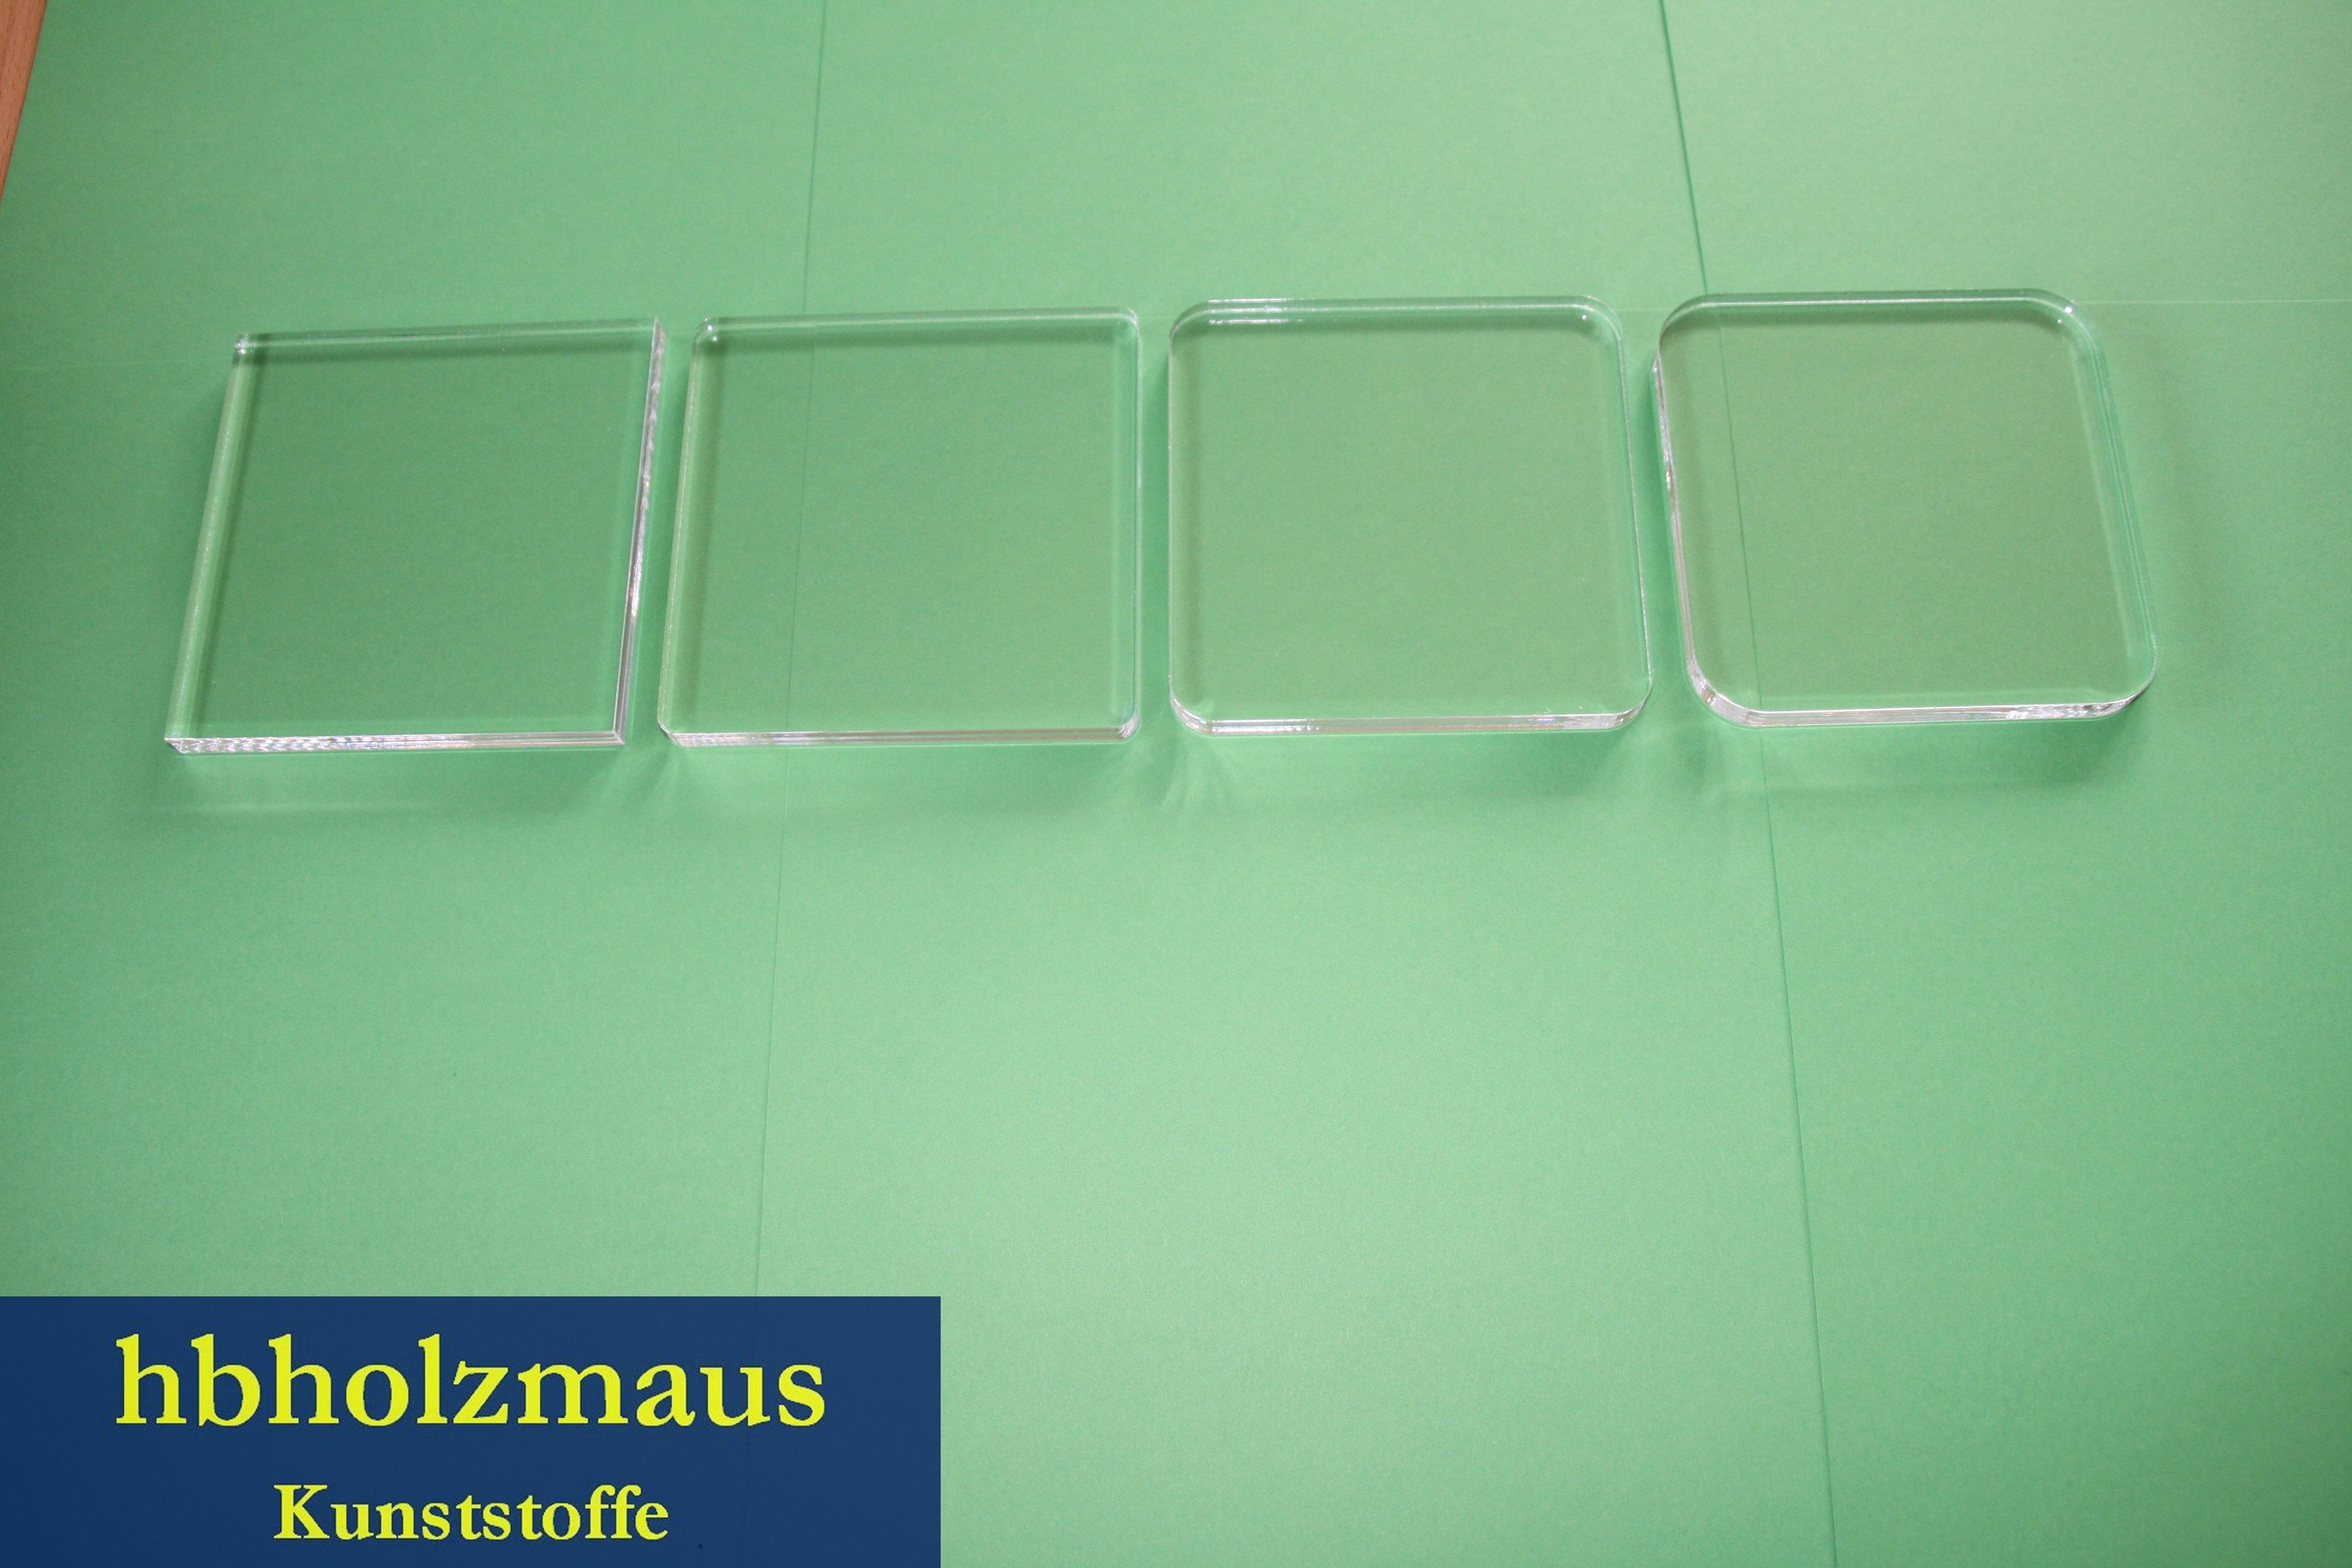 hbholzmaus kunststoffplatten shop f r acrylglas plexiglas acrifix polycarbonat makrolon. Black Bedroom Furniture Sets. Home Design Ideas